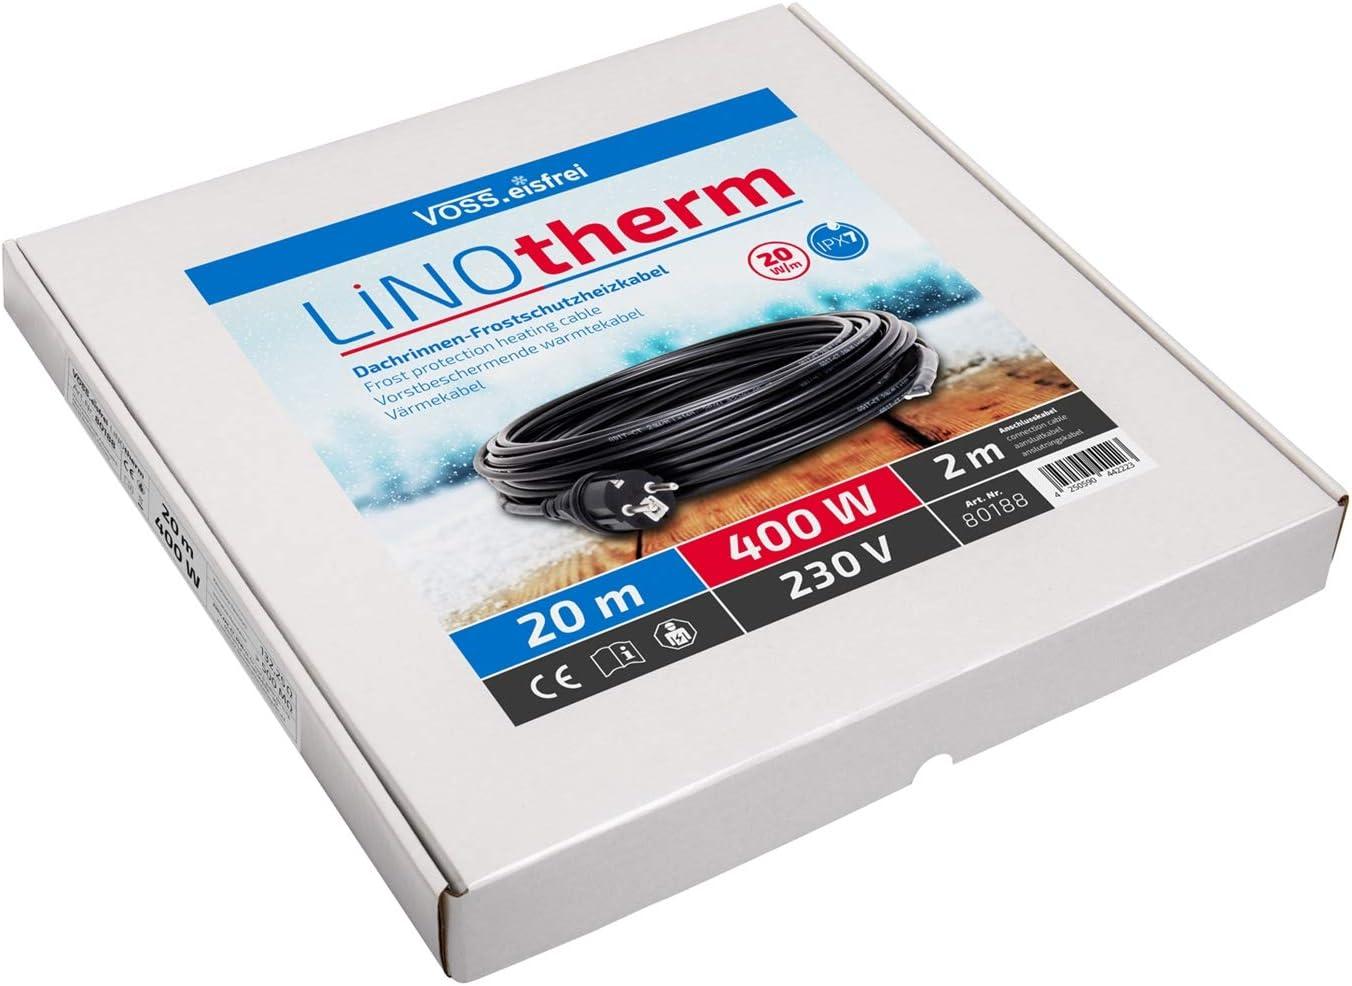 20m Cable Calentador T/érmico 400W VOSS.eisfrei Linotherm Cable Calefactor de tuber/ías